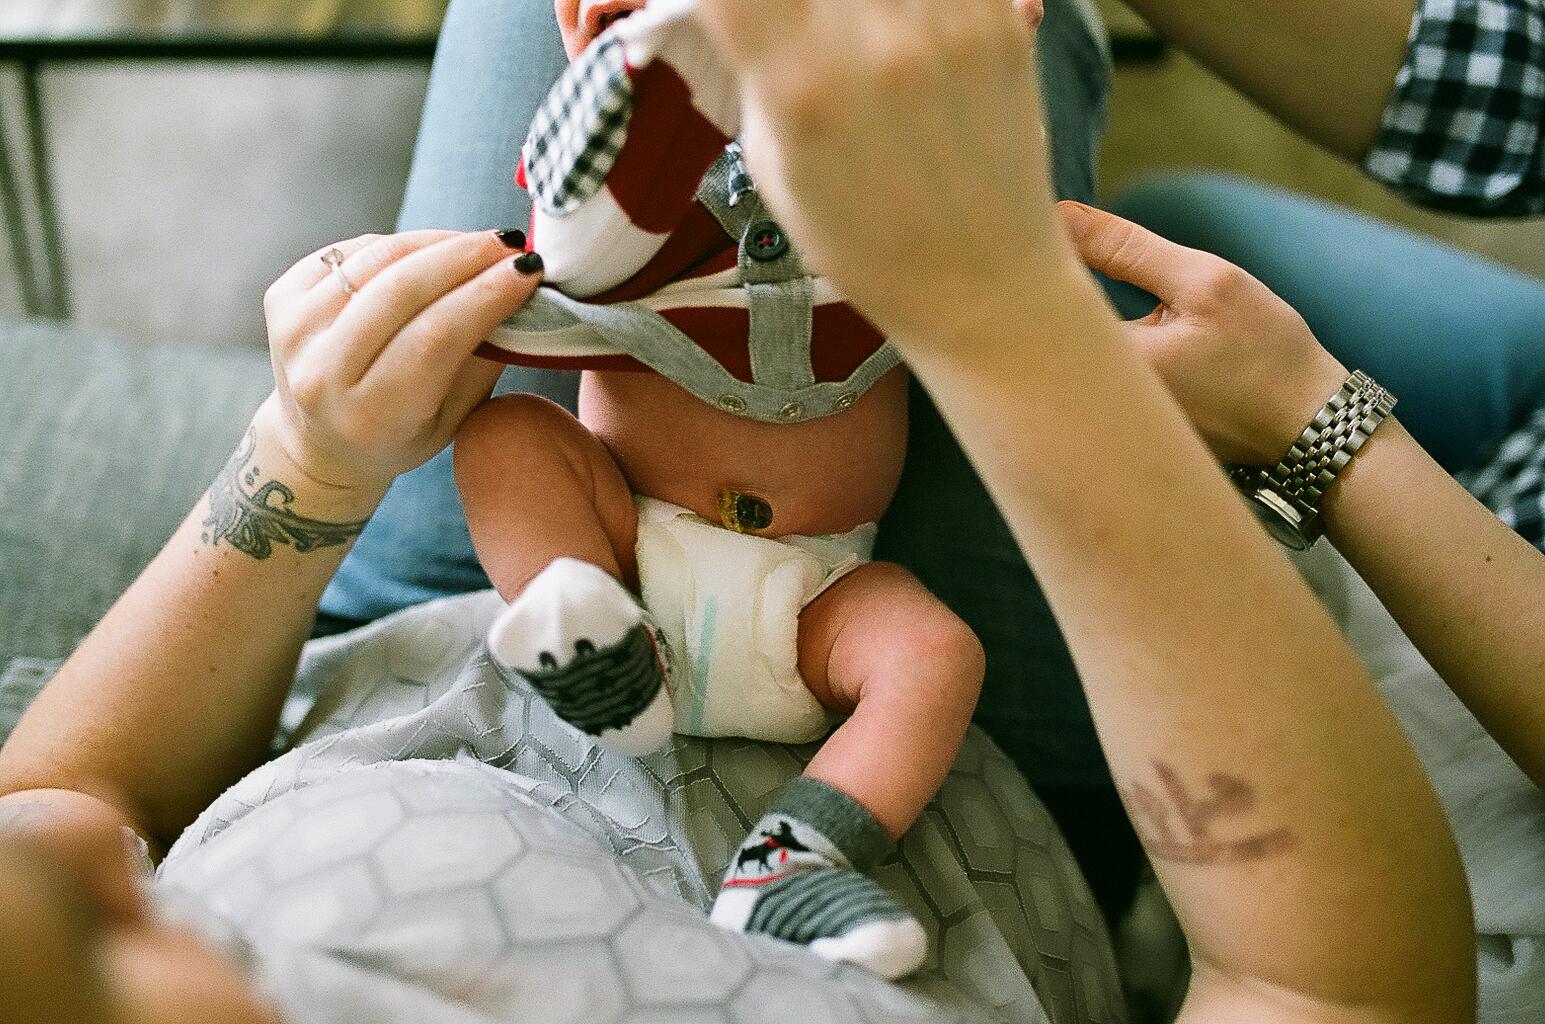 columbus newborn film photography (14 of 23).JPG